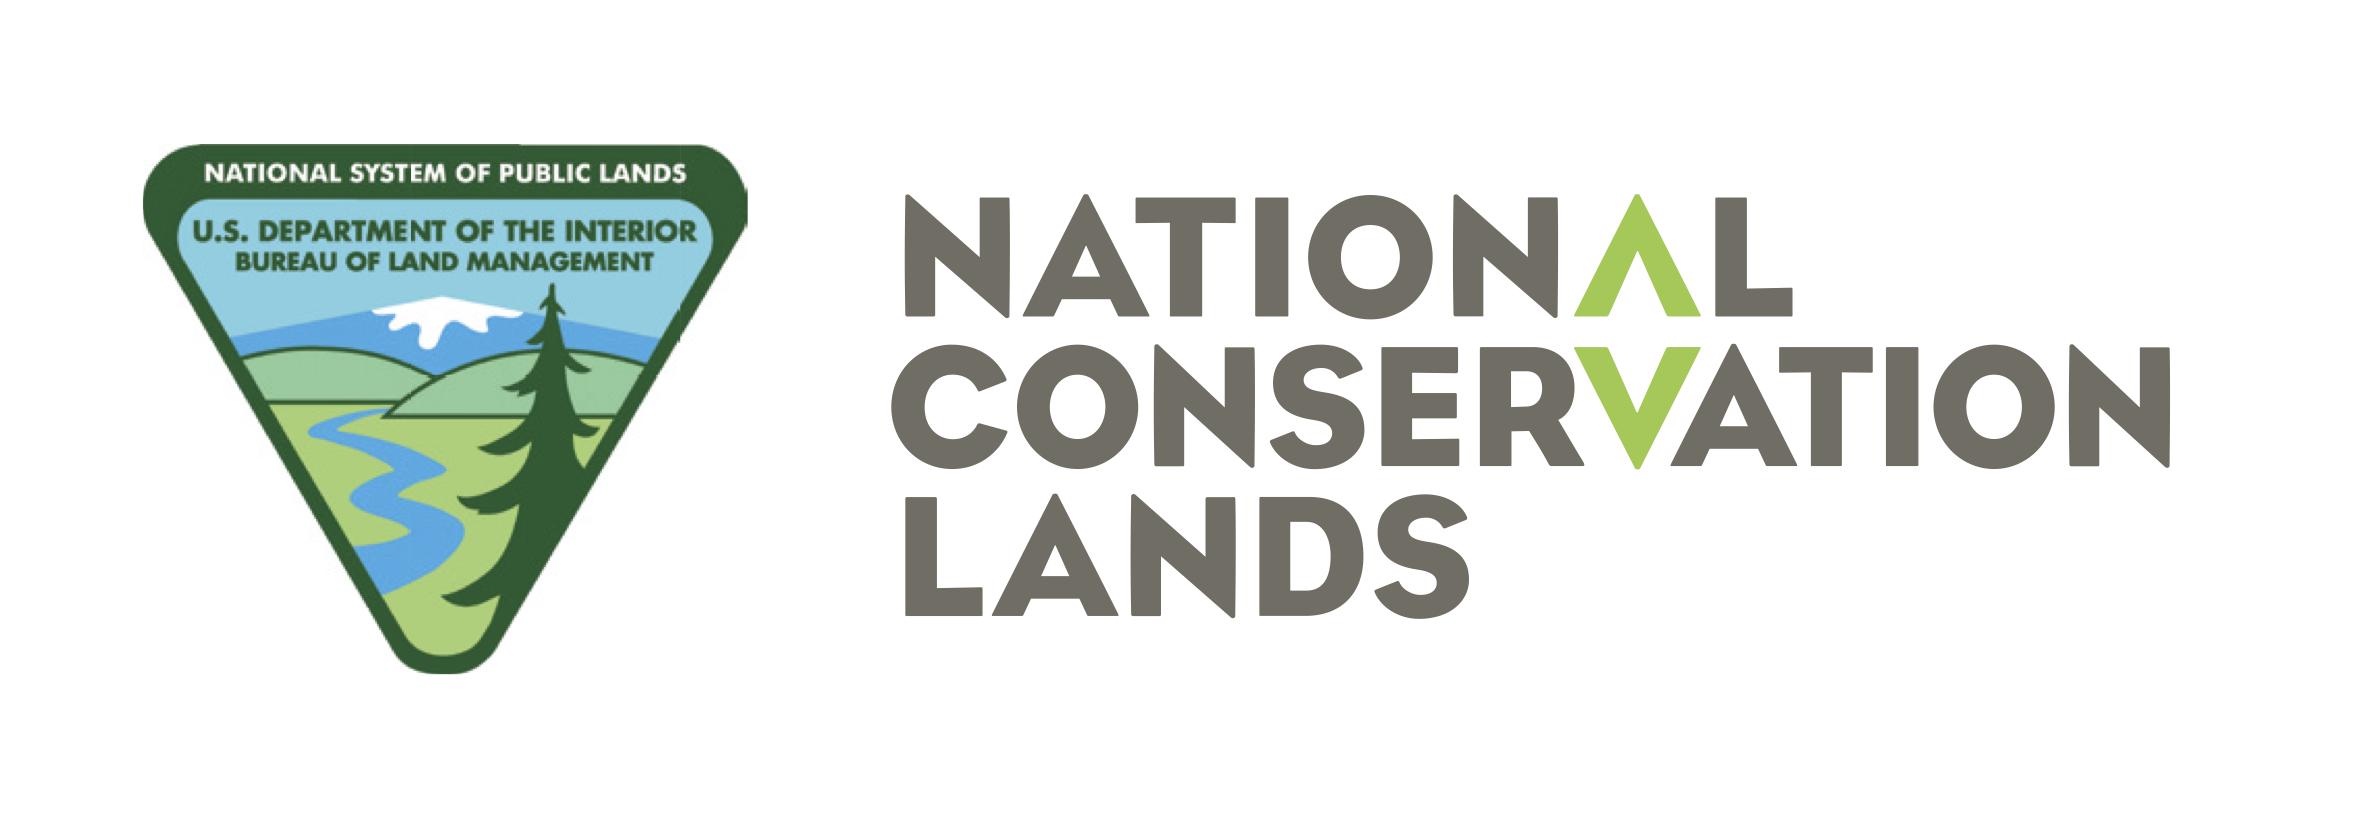 U.S Dept Bureau of Land Management